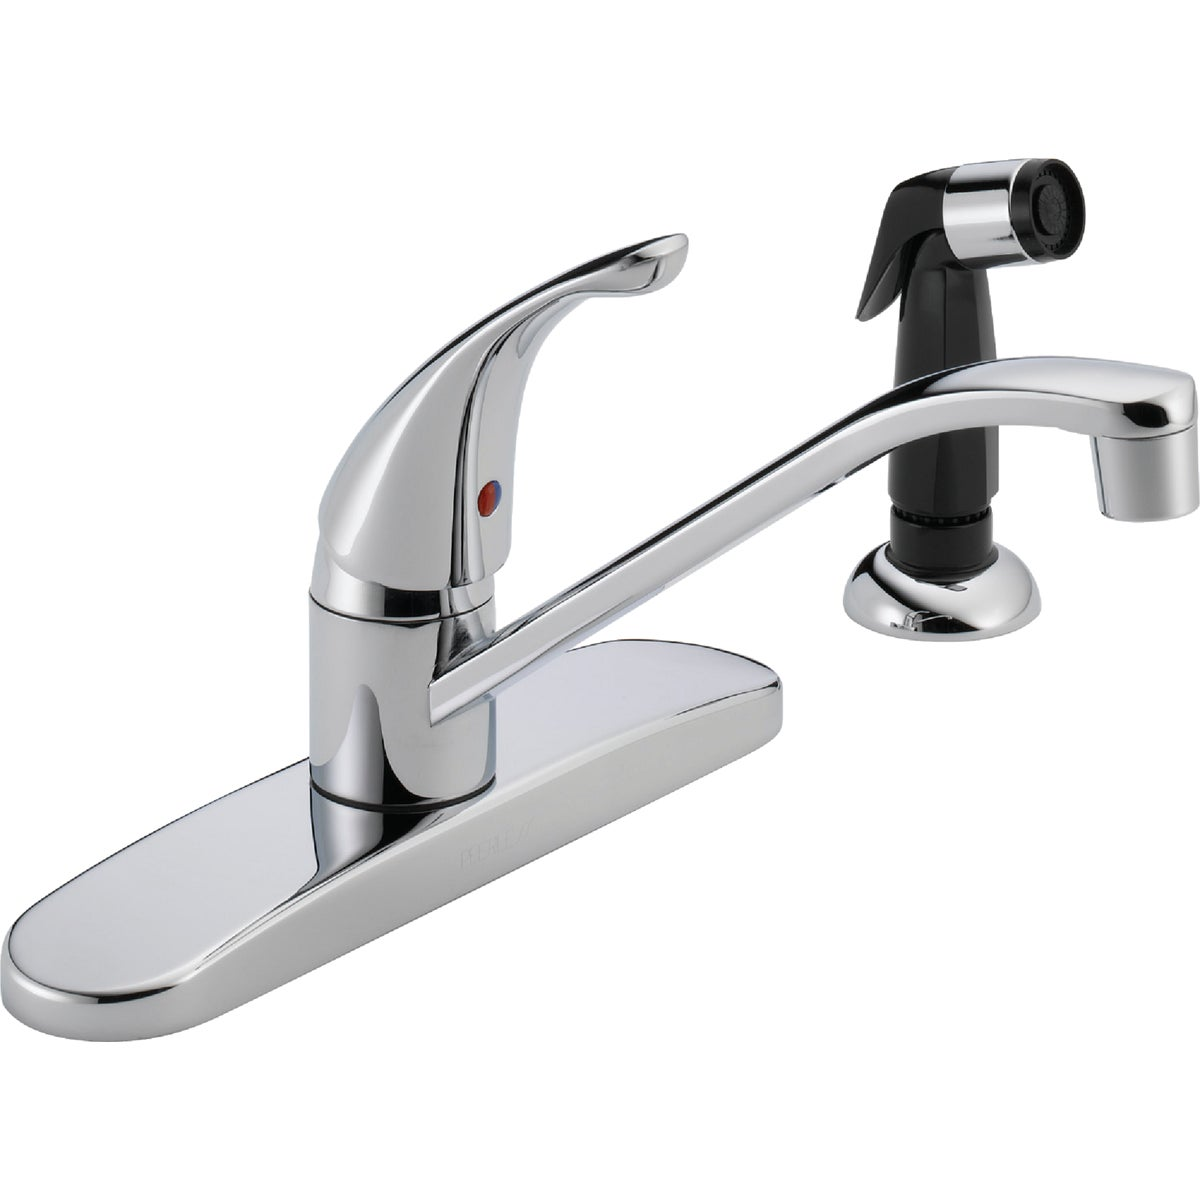 Peerless P15LF Classic Single Handle Kitchen Faucet, Chrome